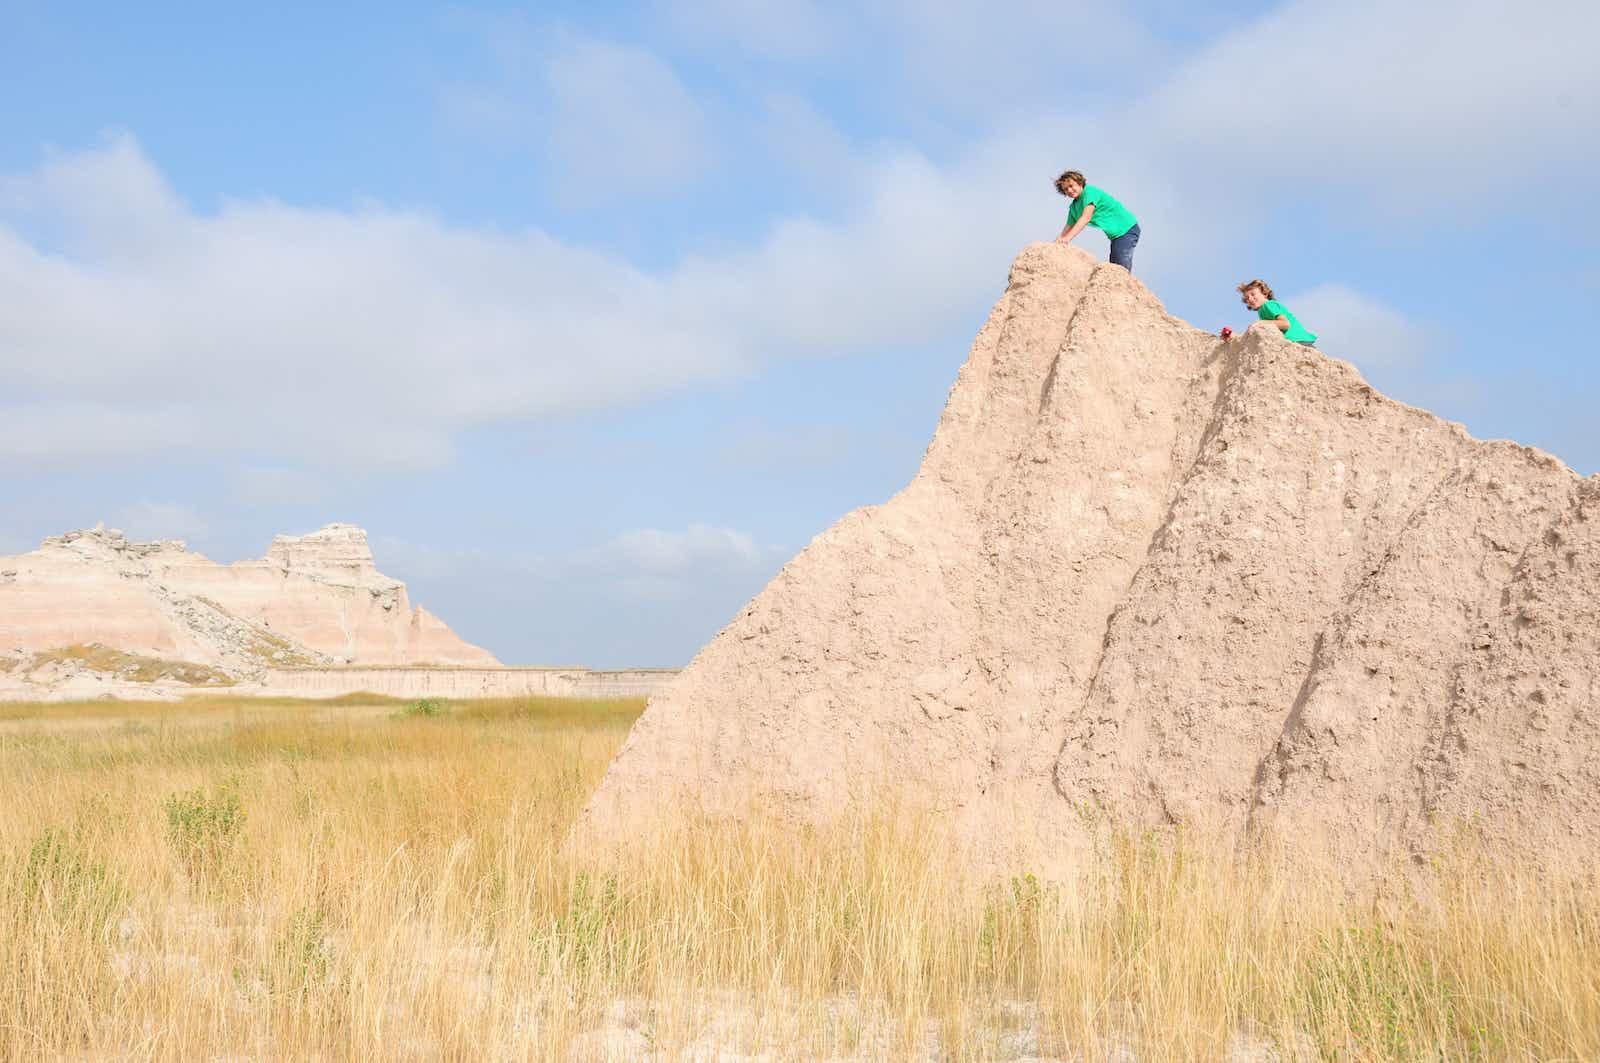 Two boys hiking in Badlands National Park, South Dakota